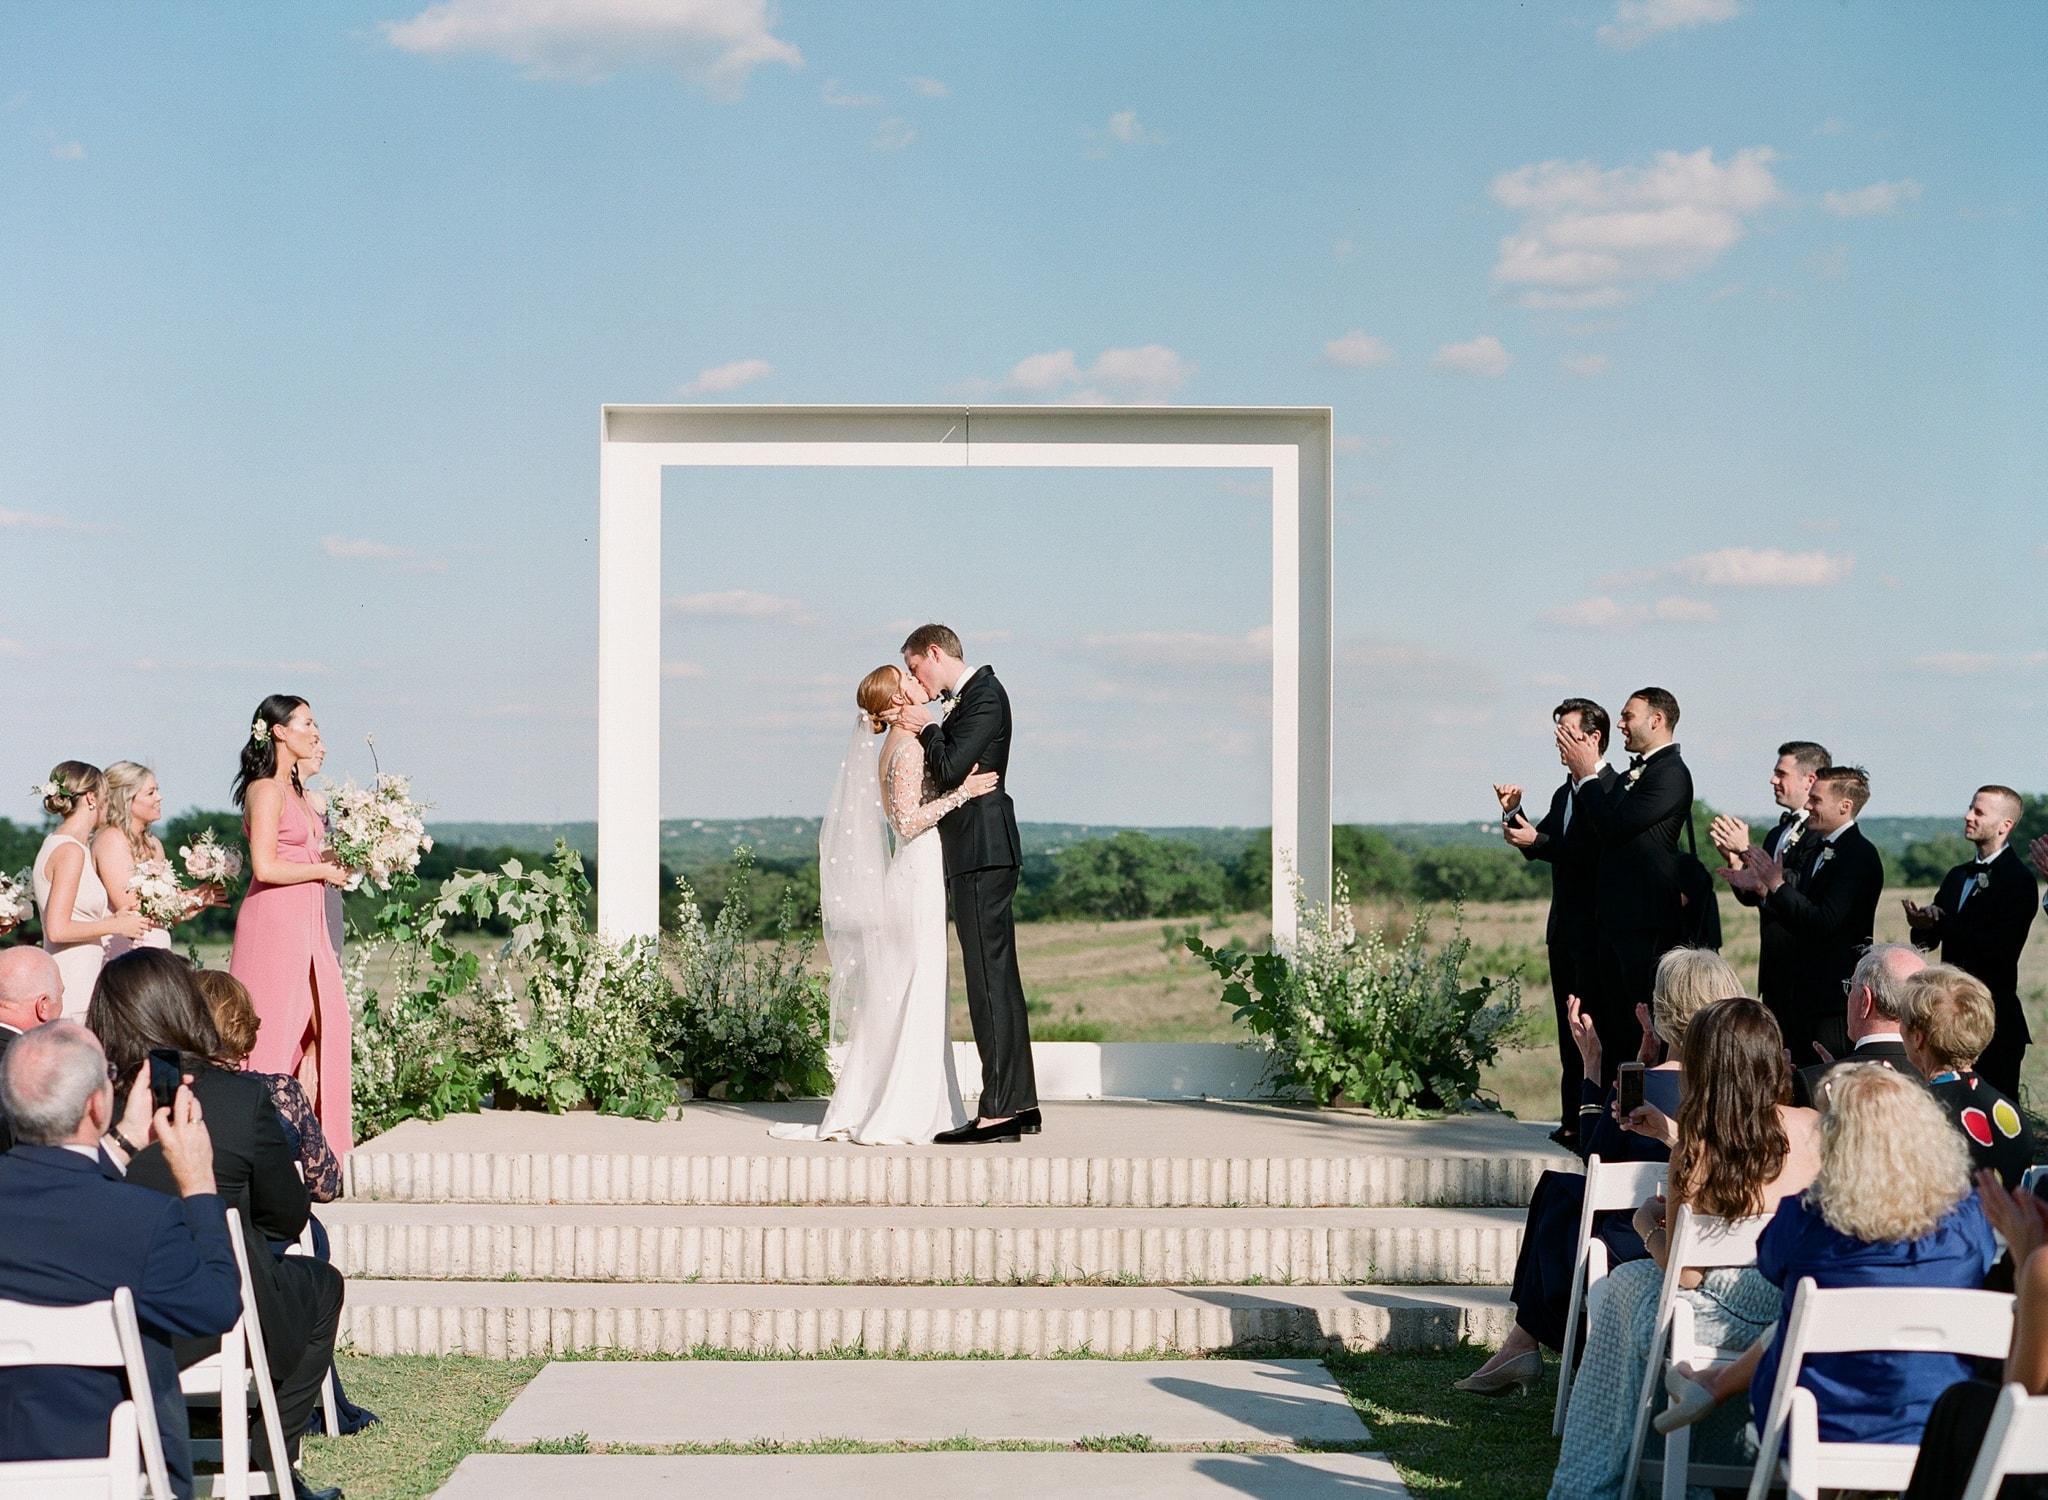 PROSPECT_HOUSE_WEDDING_AUSTIN_TX_MATTHEW_MOORE-00521_A.jpg